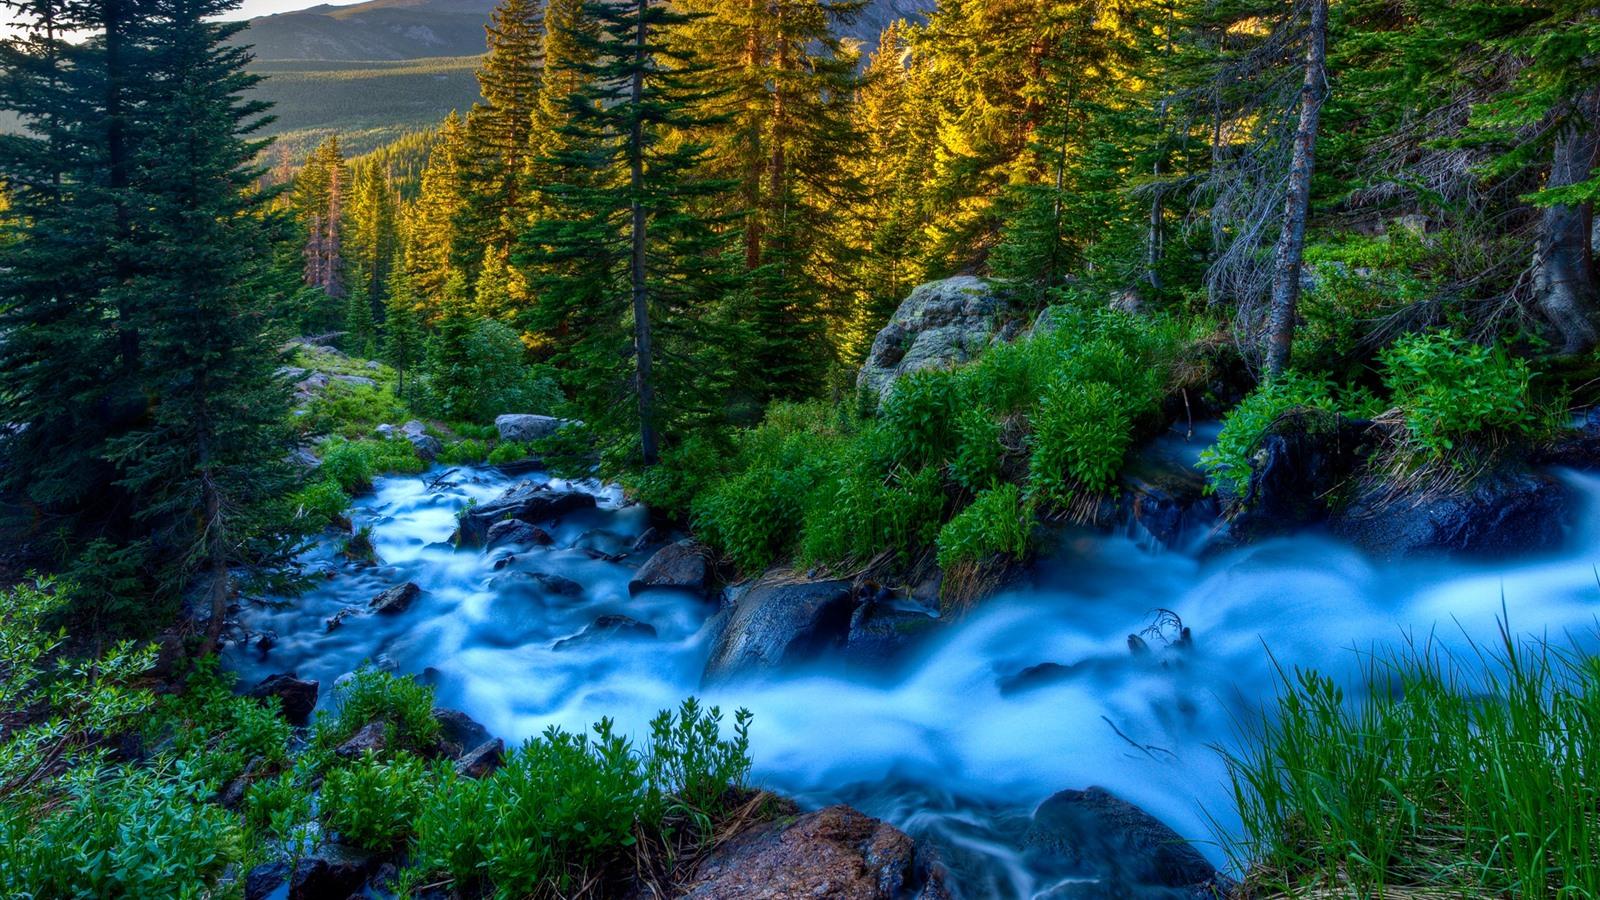 Wallpaper Beautiful Nature Stream Trees 2560x1600 Hd